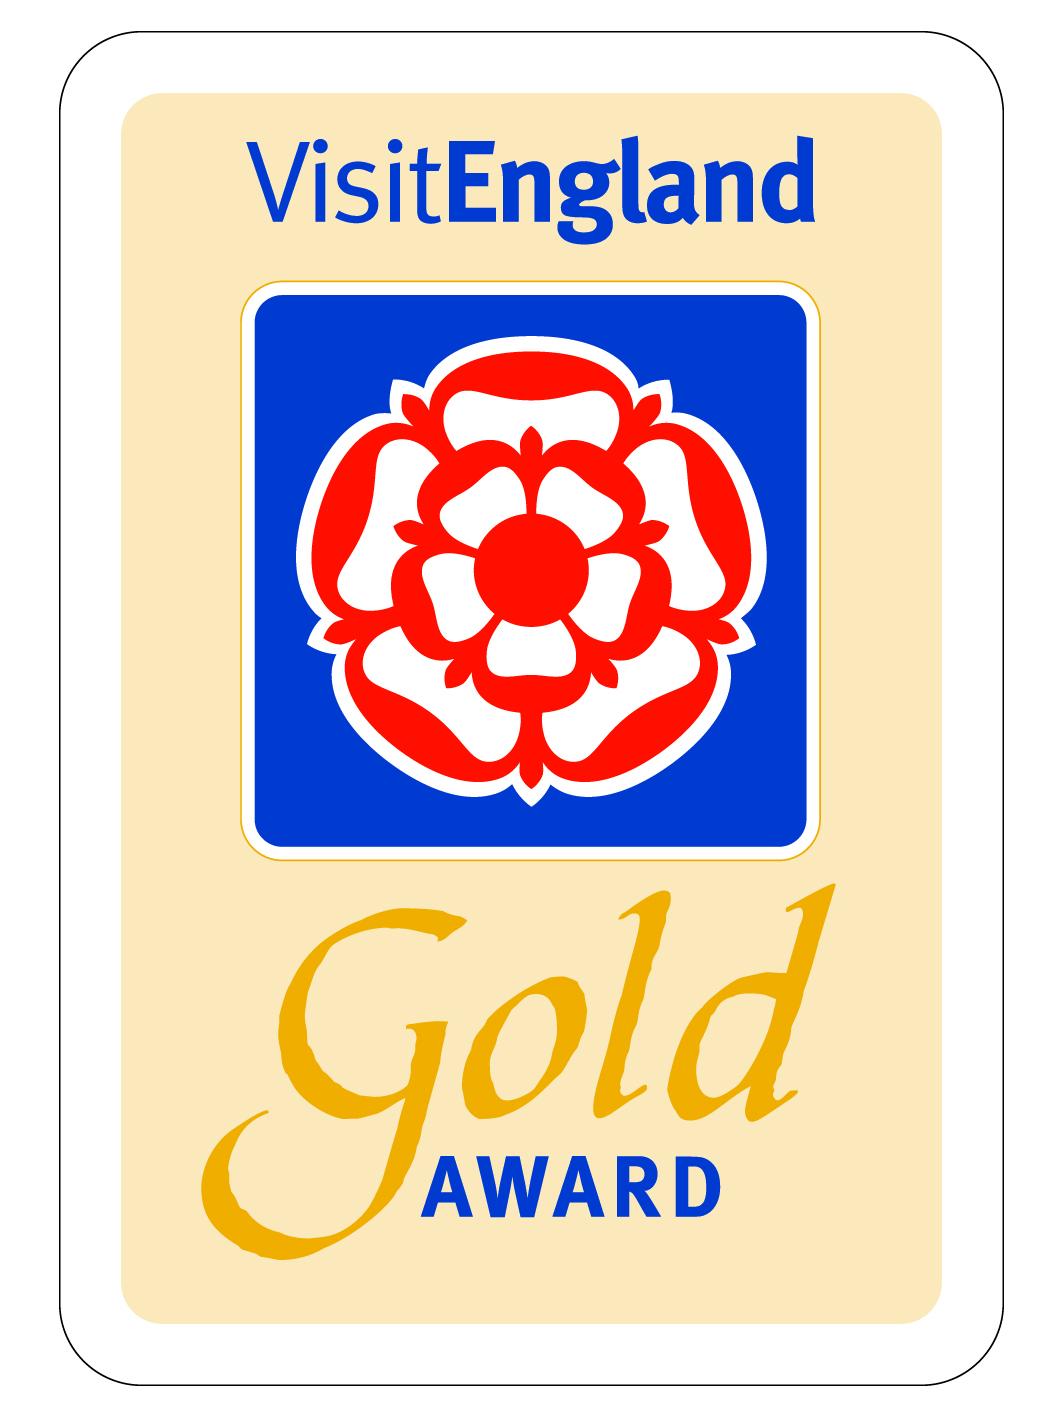 Gold-Award-Sticker-Sign2.jpg